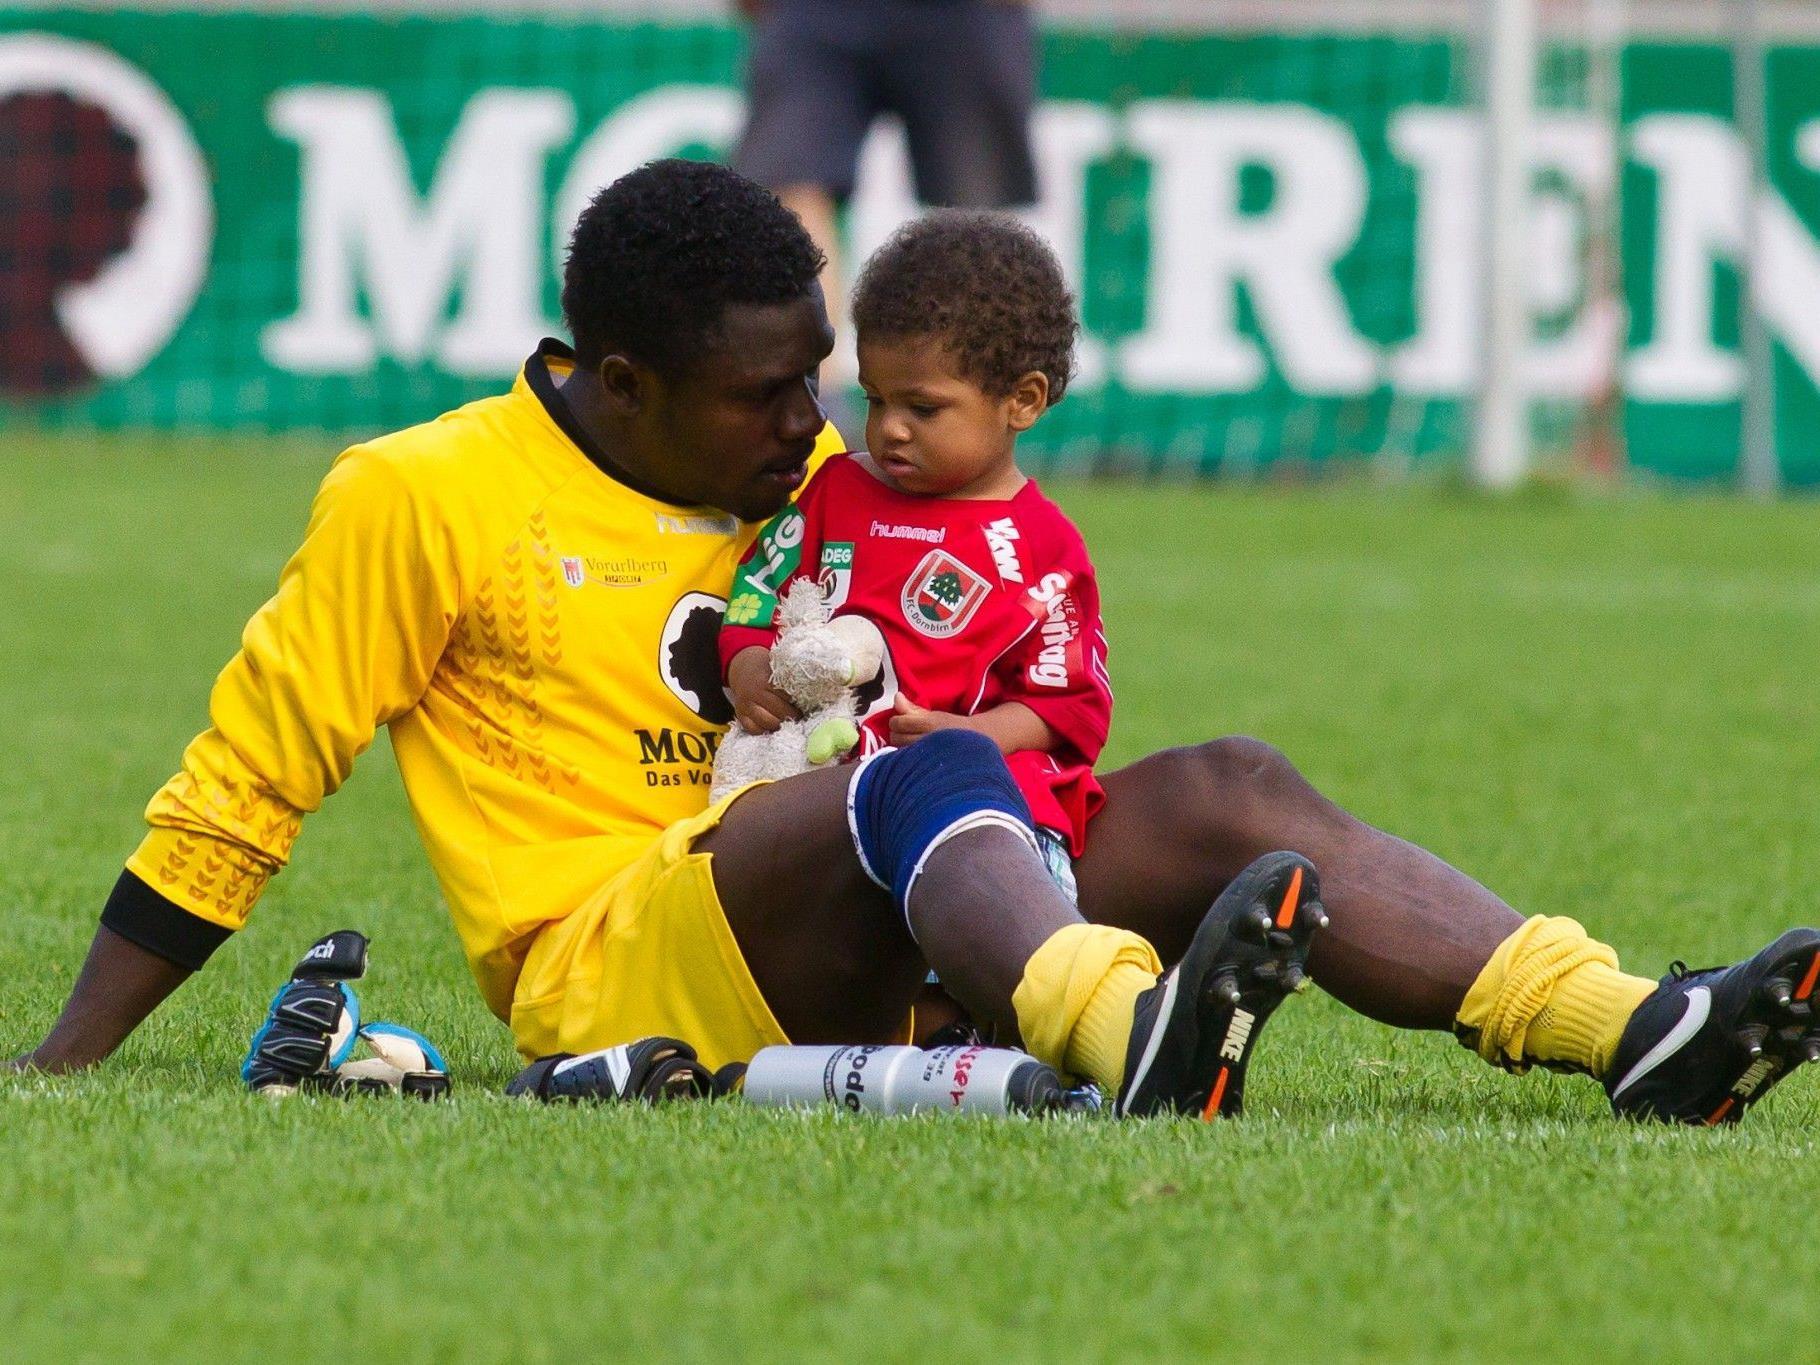 Edwin-Joshua Ndybisi, Torhüter beim FC Mohren Dornbirn.